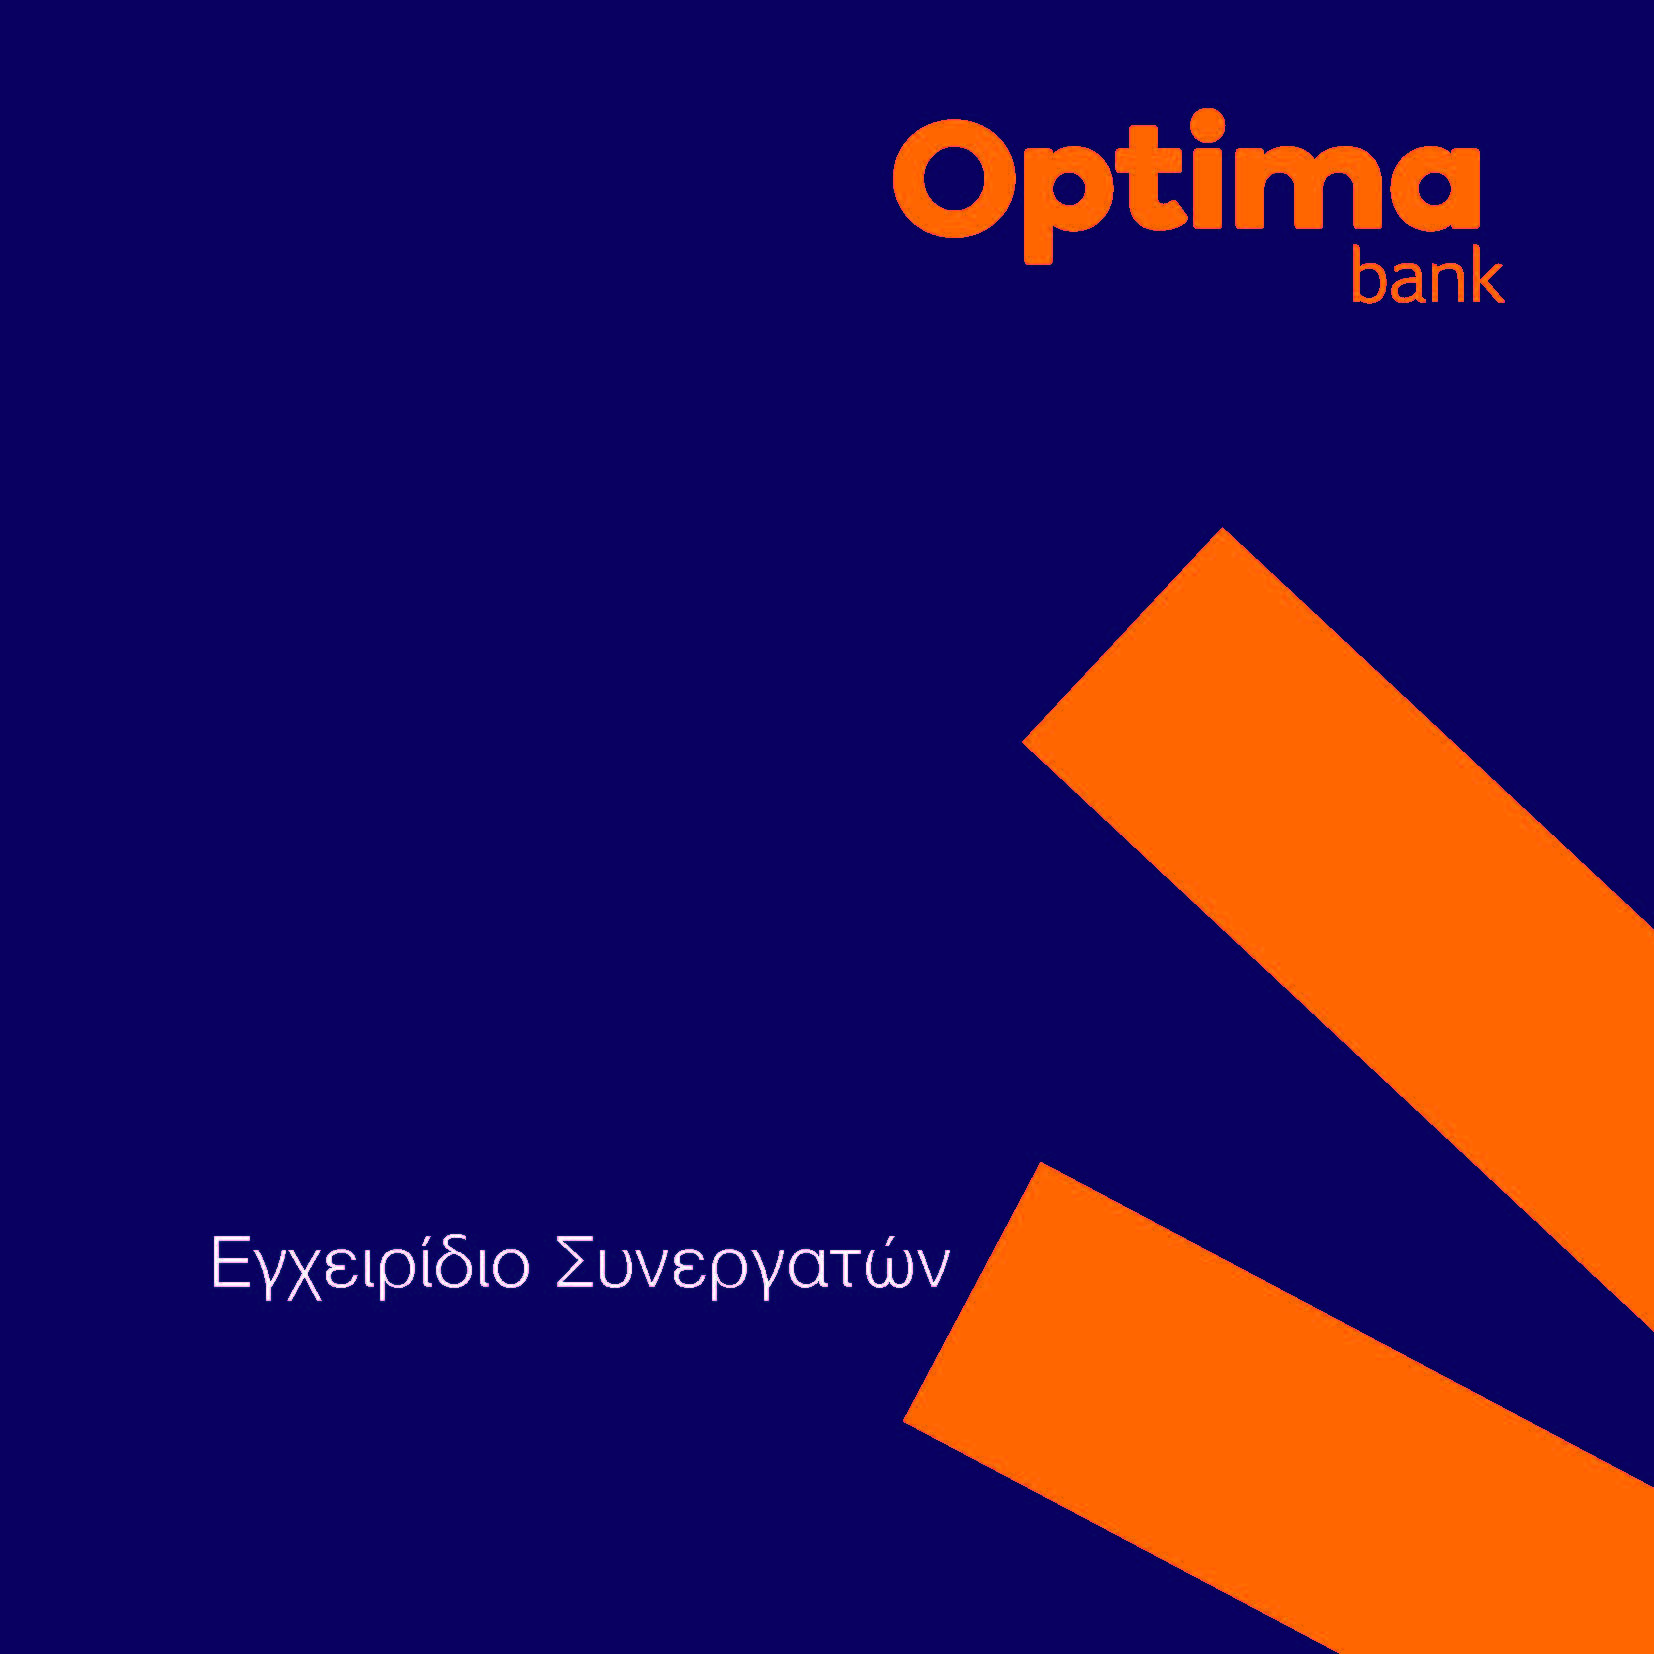 https://www.jib.gr/wp-content/uploads/2020/09/OPTIMA-BANK-BOOKLET-WEB_Page_001.jpg